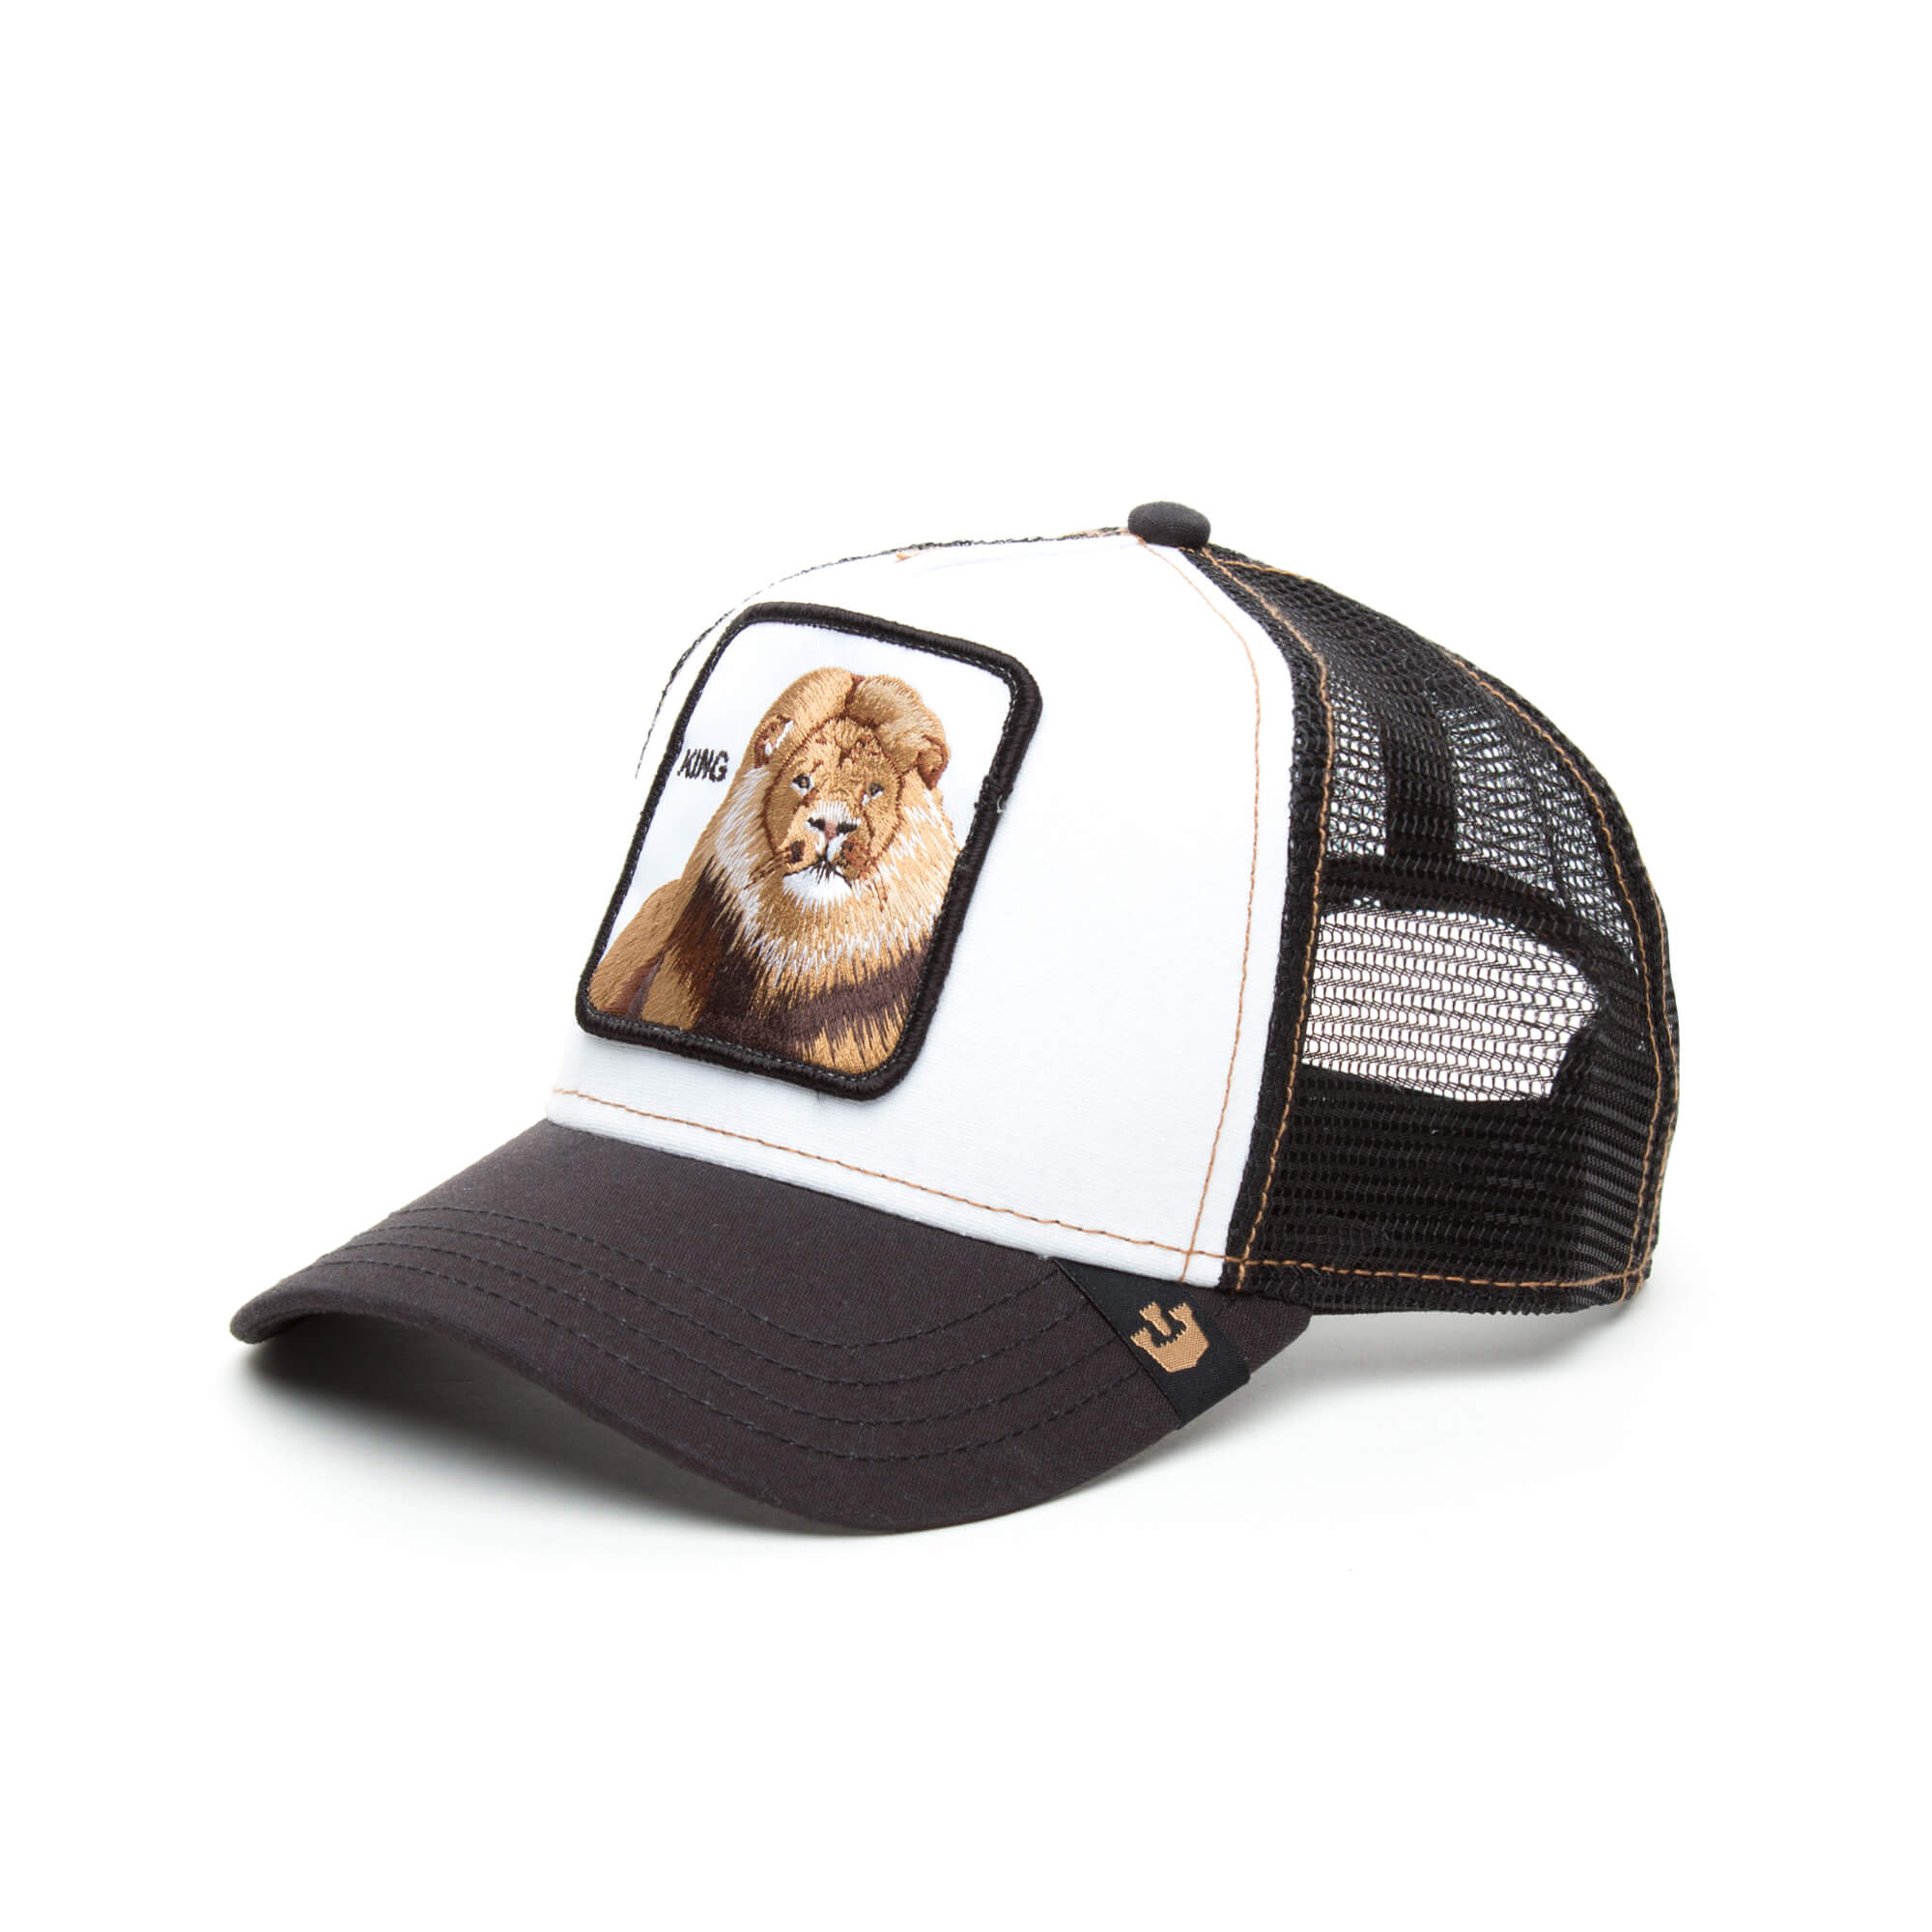 Goorin Bros King Unisex Siyah-Beyaz Şapka